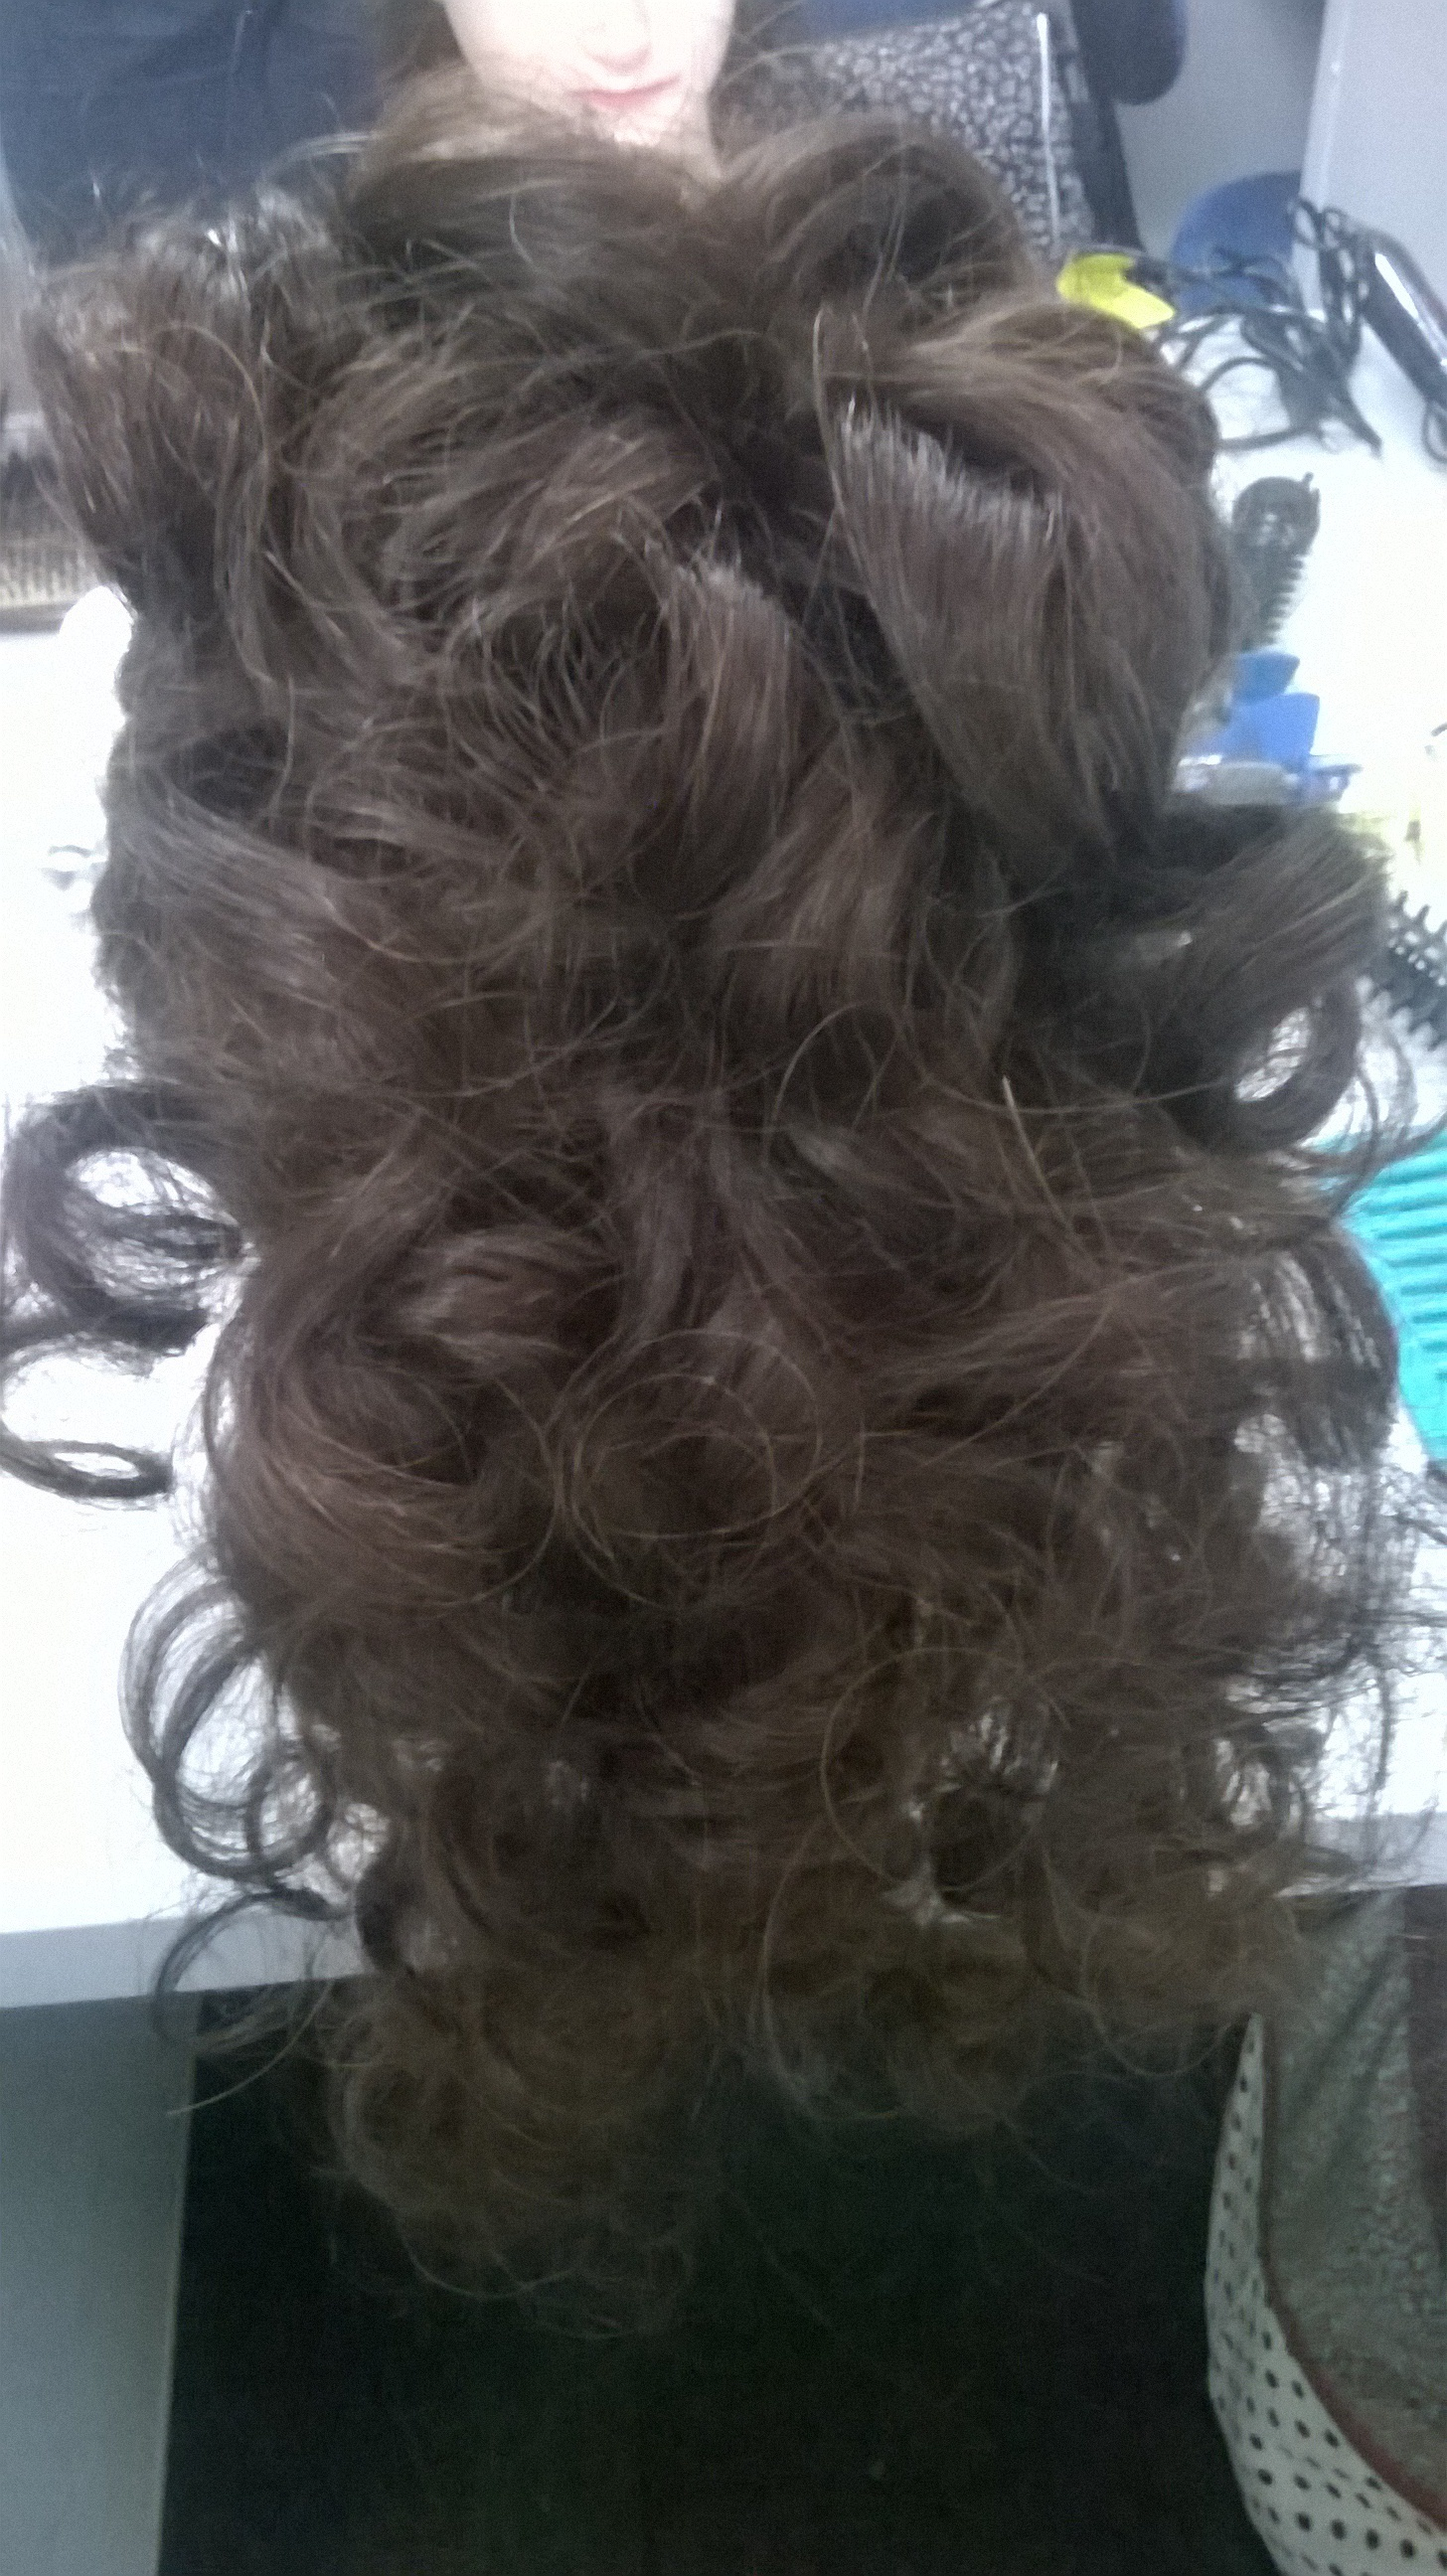 Segunda Aula de Penteado - Cachos Elevados cabelo cabeleireiro(a) estudante (esteticista)